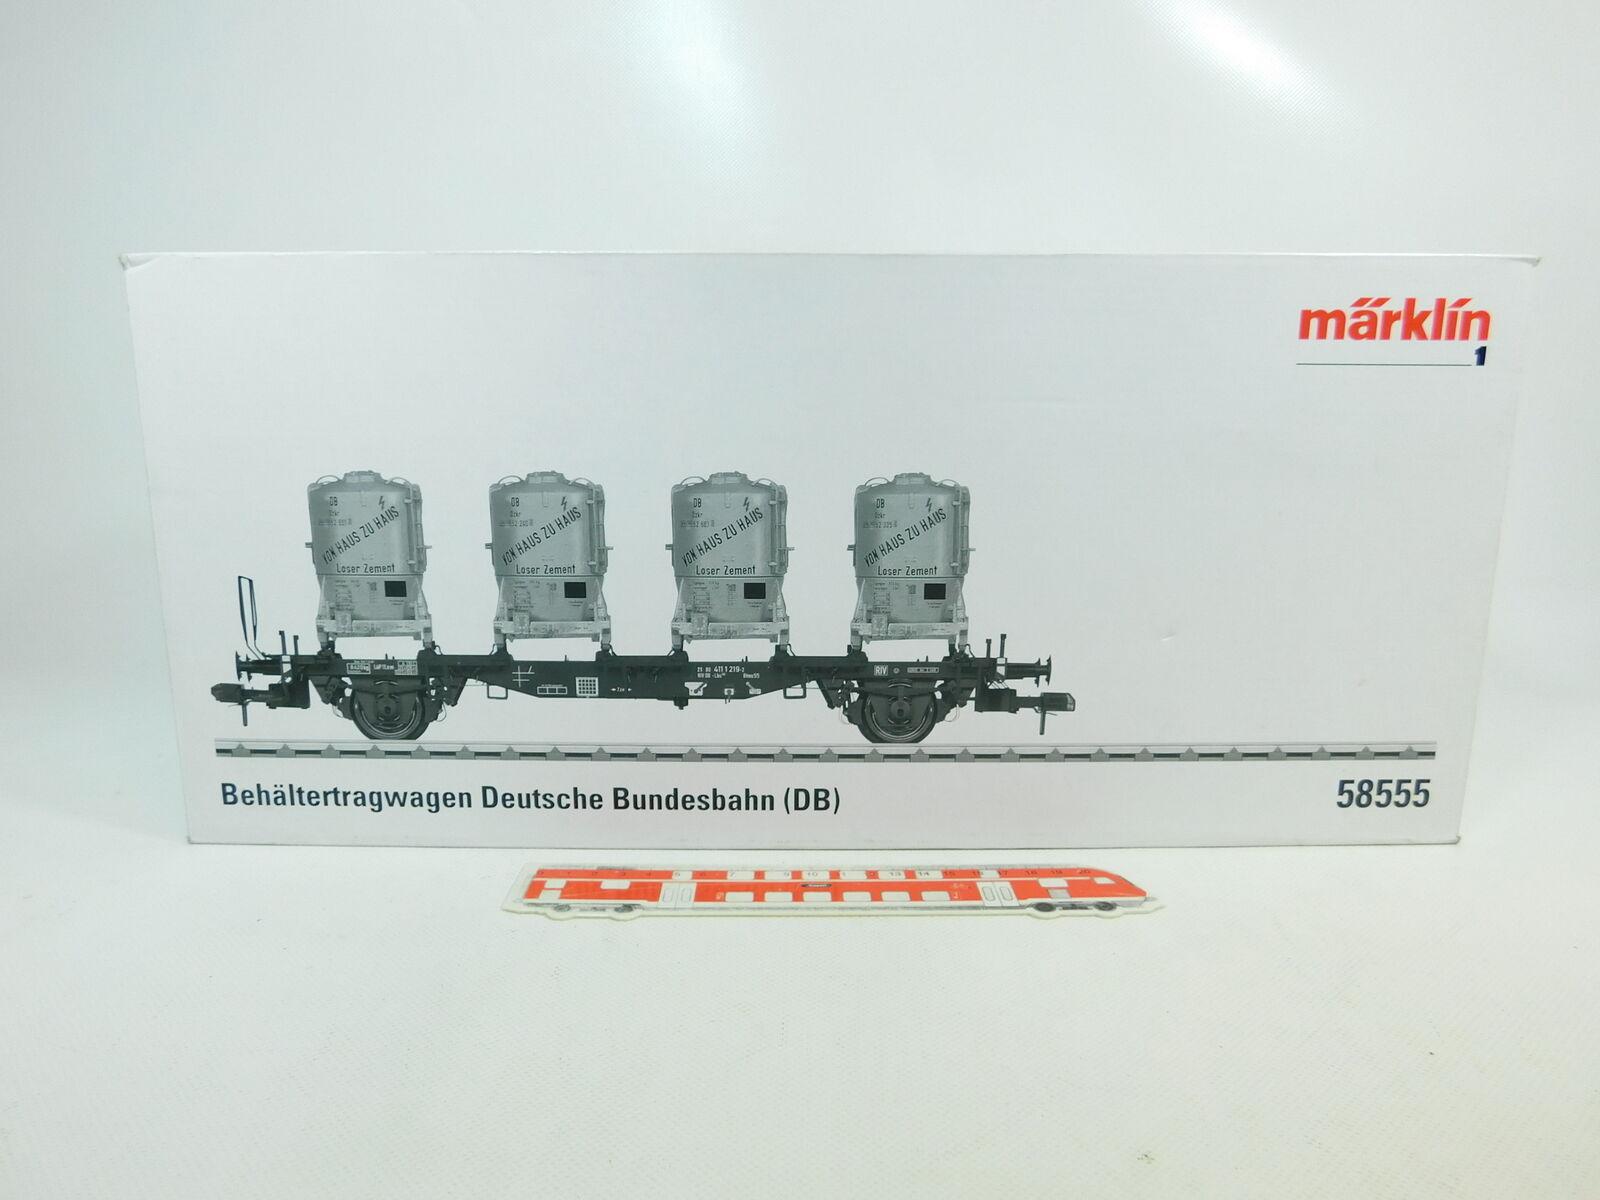 BQ223-4  Märklin Spur 1 Leerkarton für 58555 Behältertragwagen Behältertragwagen Behältertragwagen Haus zu Haus DB  | Günstige Preise  45317f